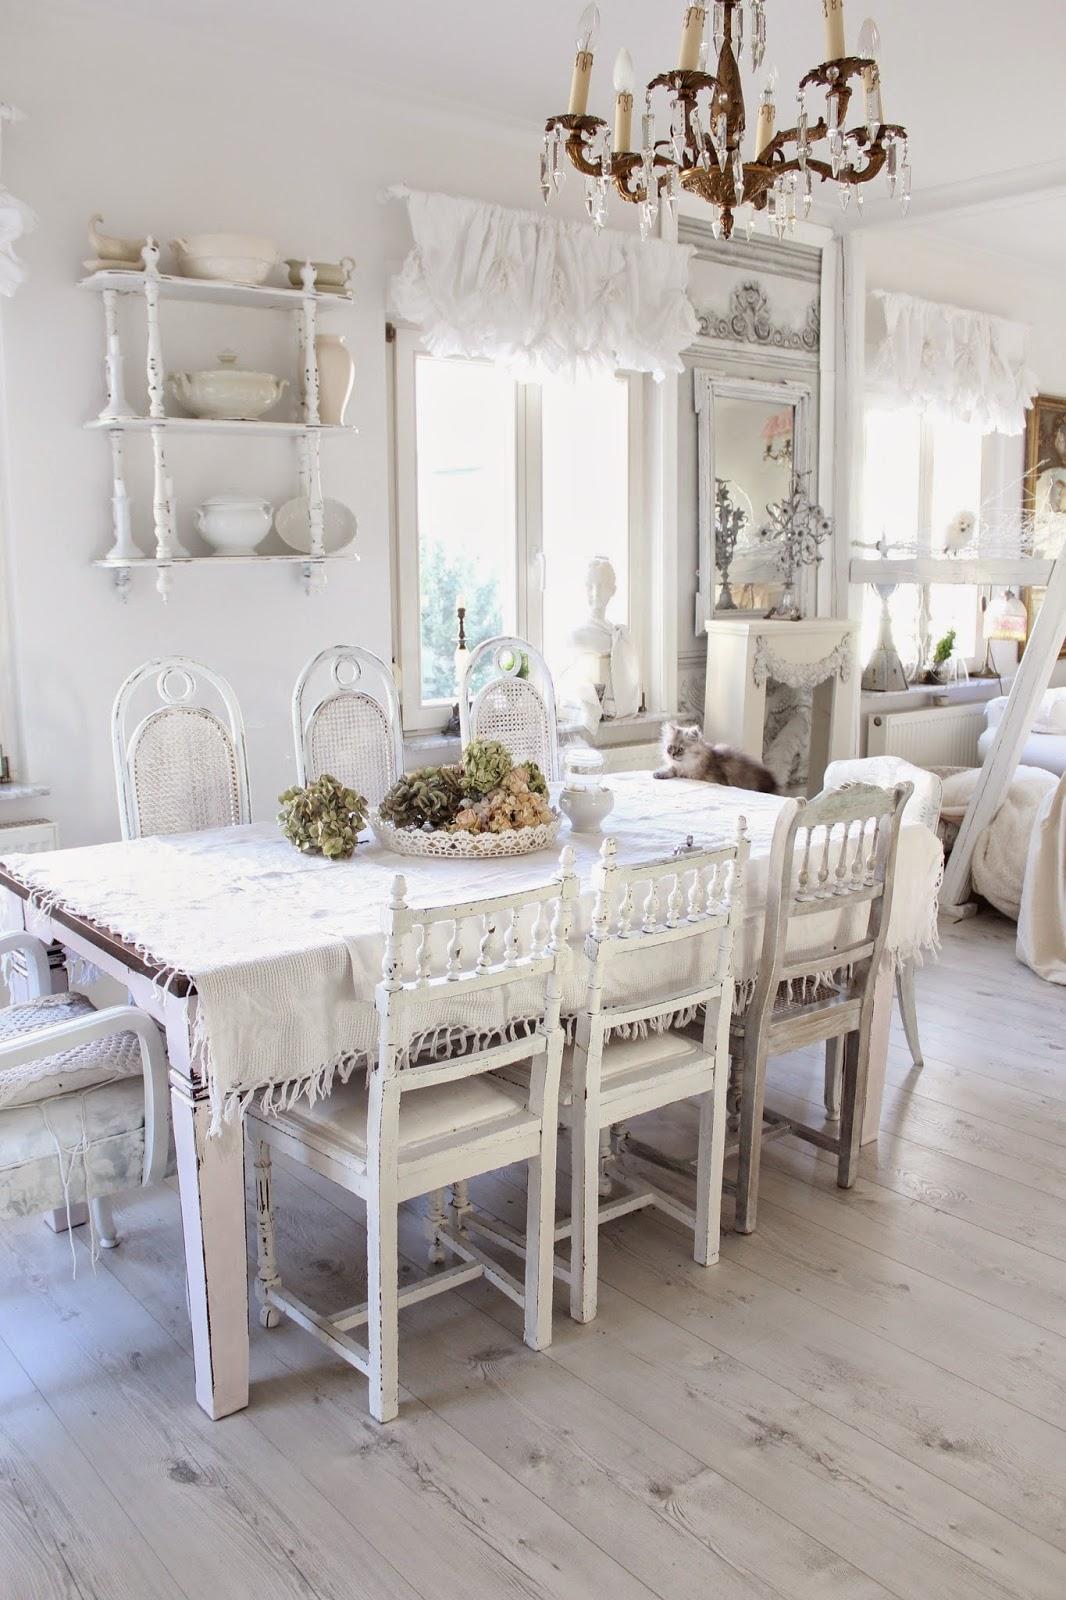 heavens ros 233 cottage weihnachtsdeko ade landes arm chair dining chairs harley butler trading